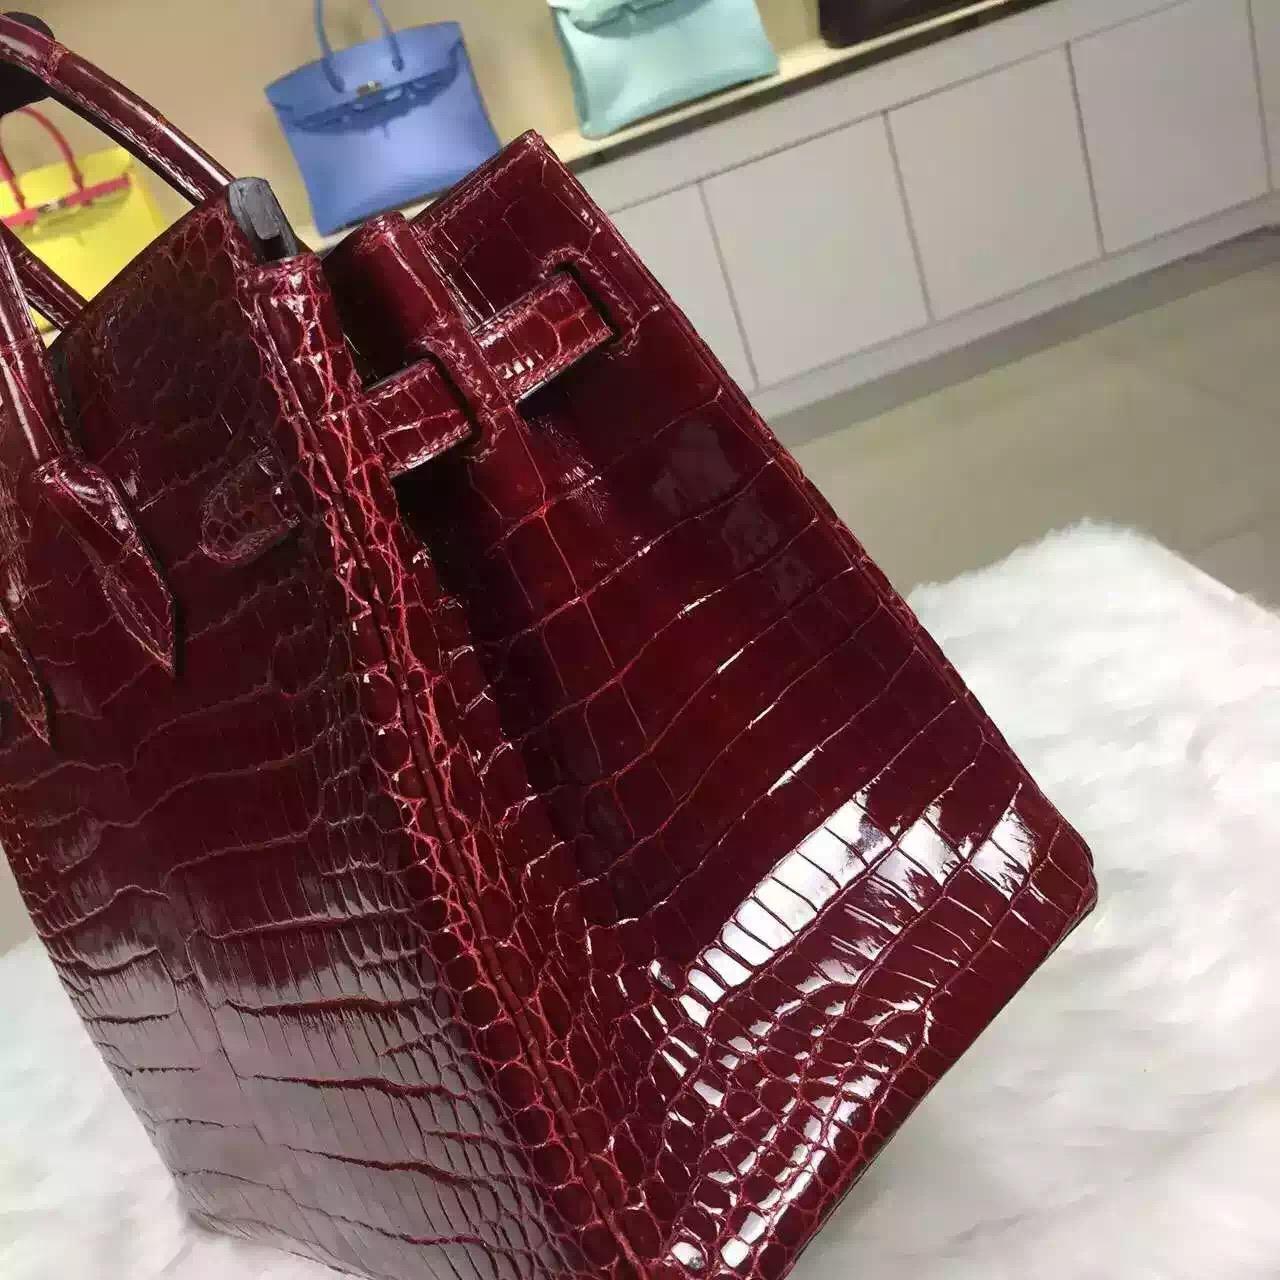 Discount Hermes Wine Red Original Porosus Crocodile Skin Birkin Bag 30cm